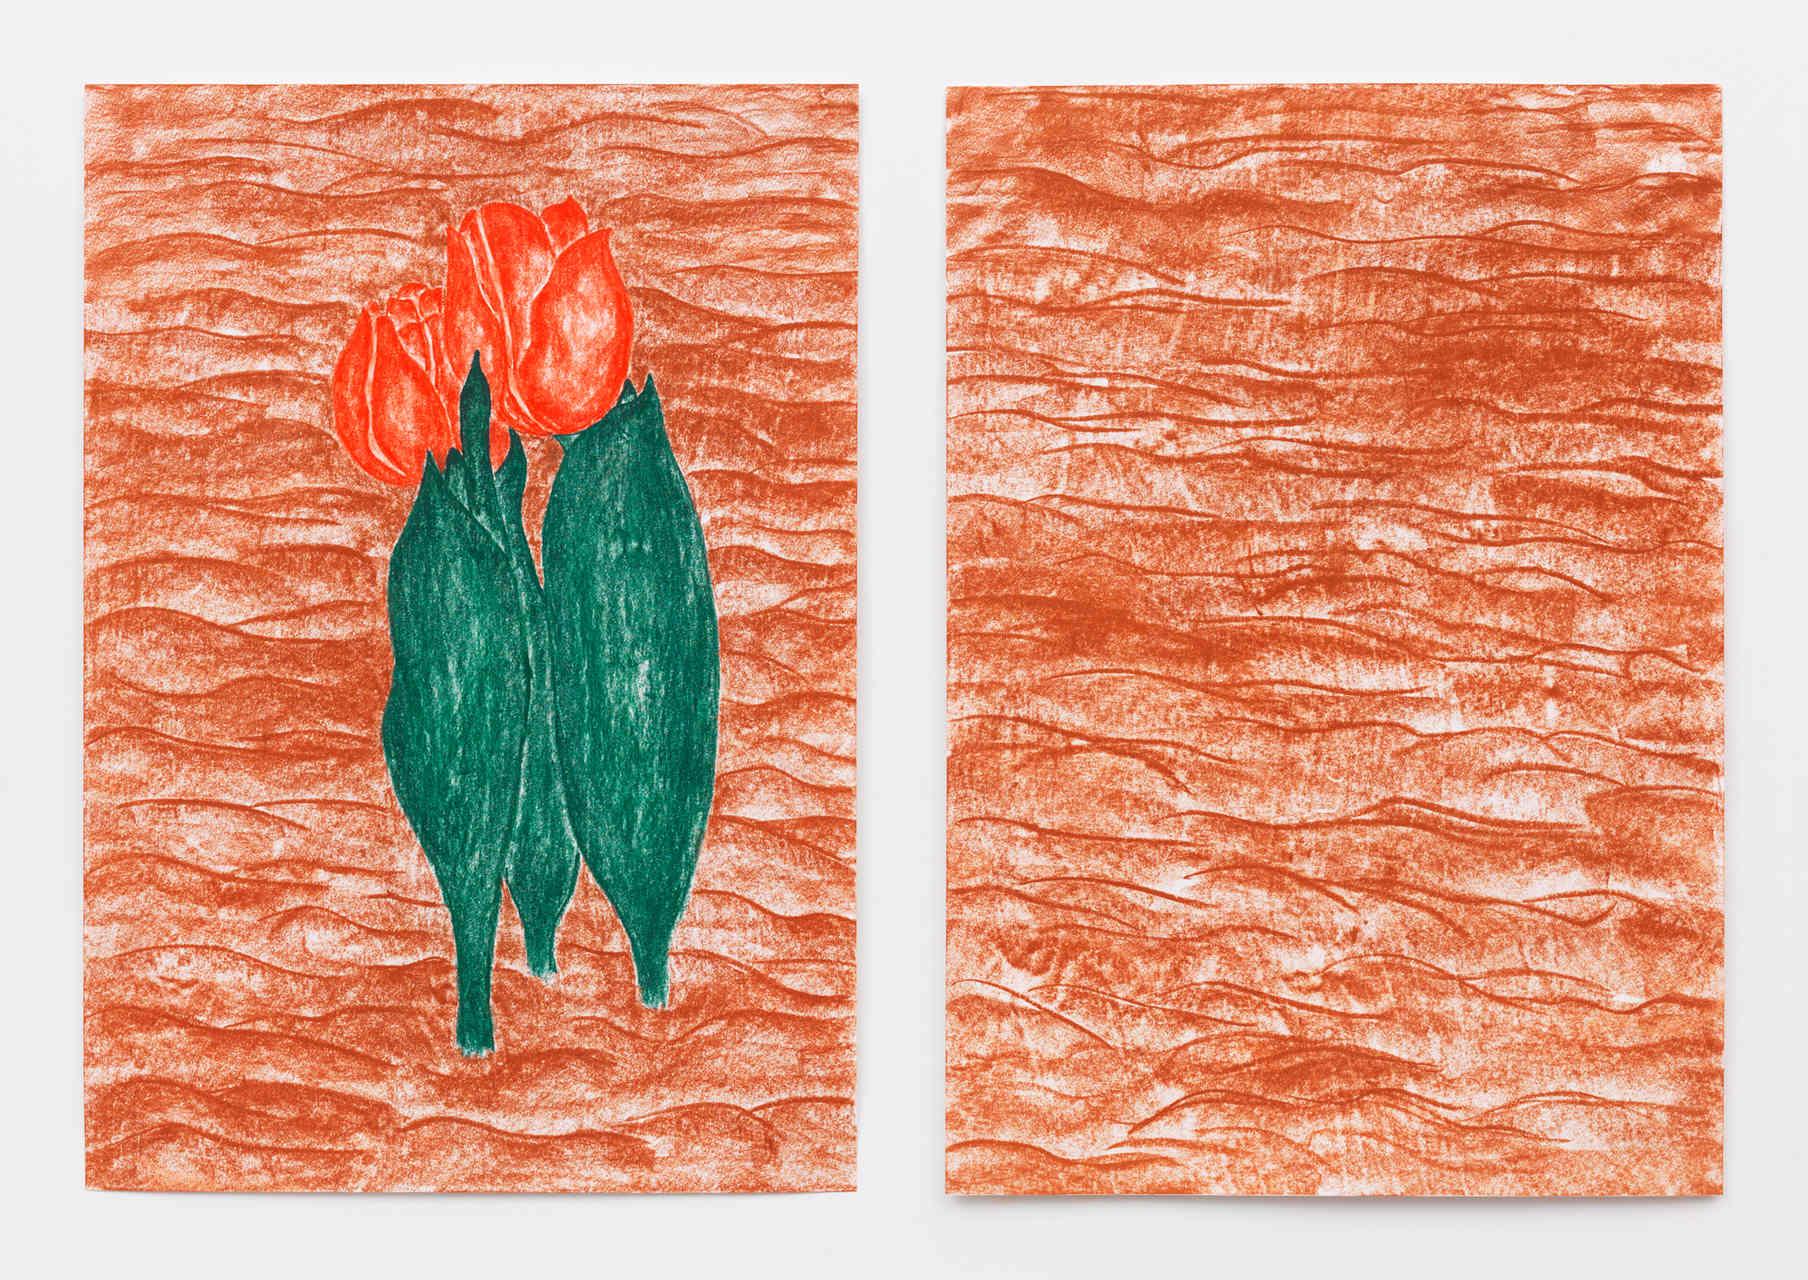 8.Tomorrow_Some-Versions-of-Pastoral-Jutta-Zimmermann